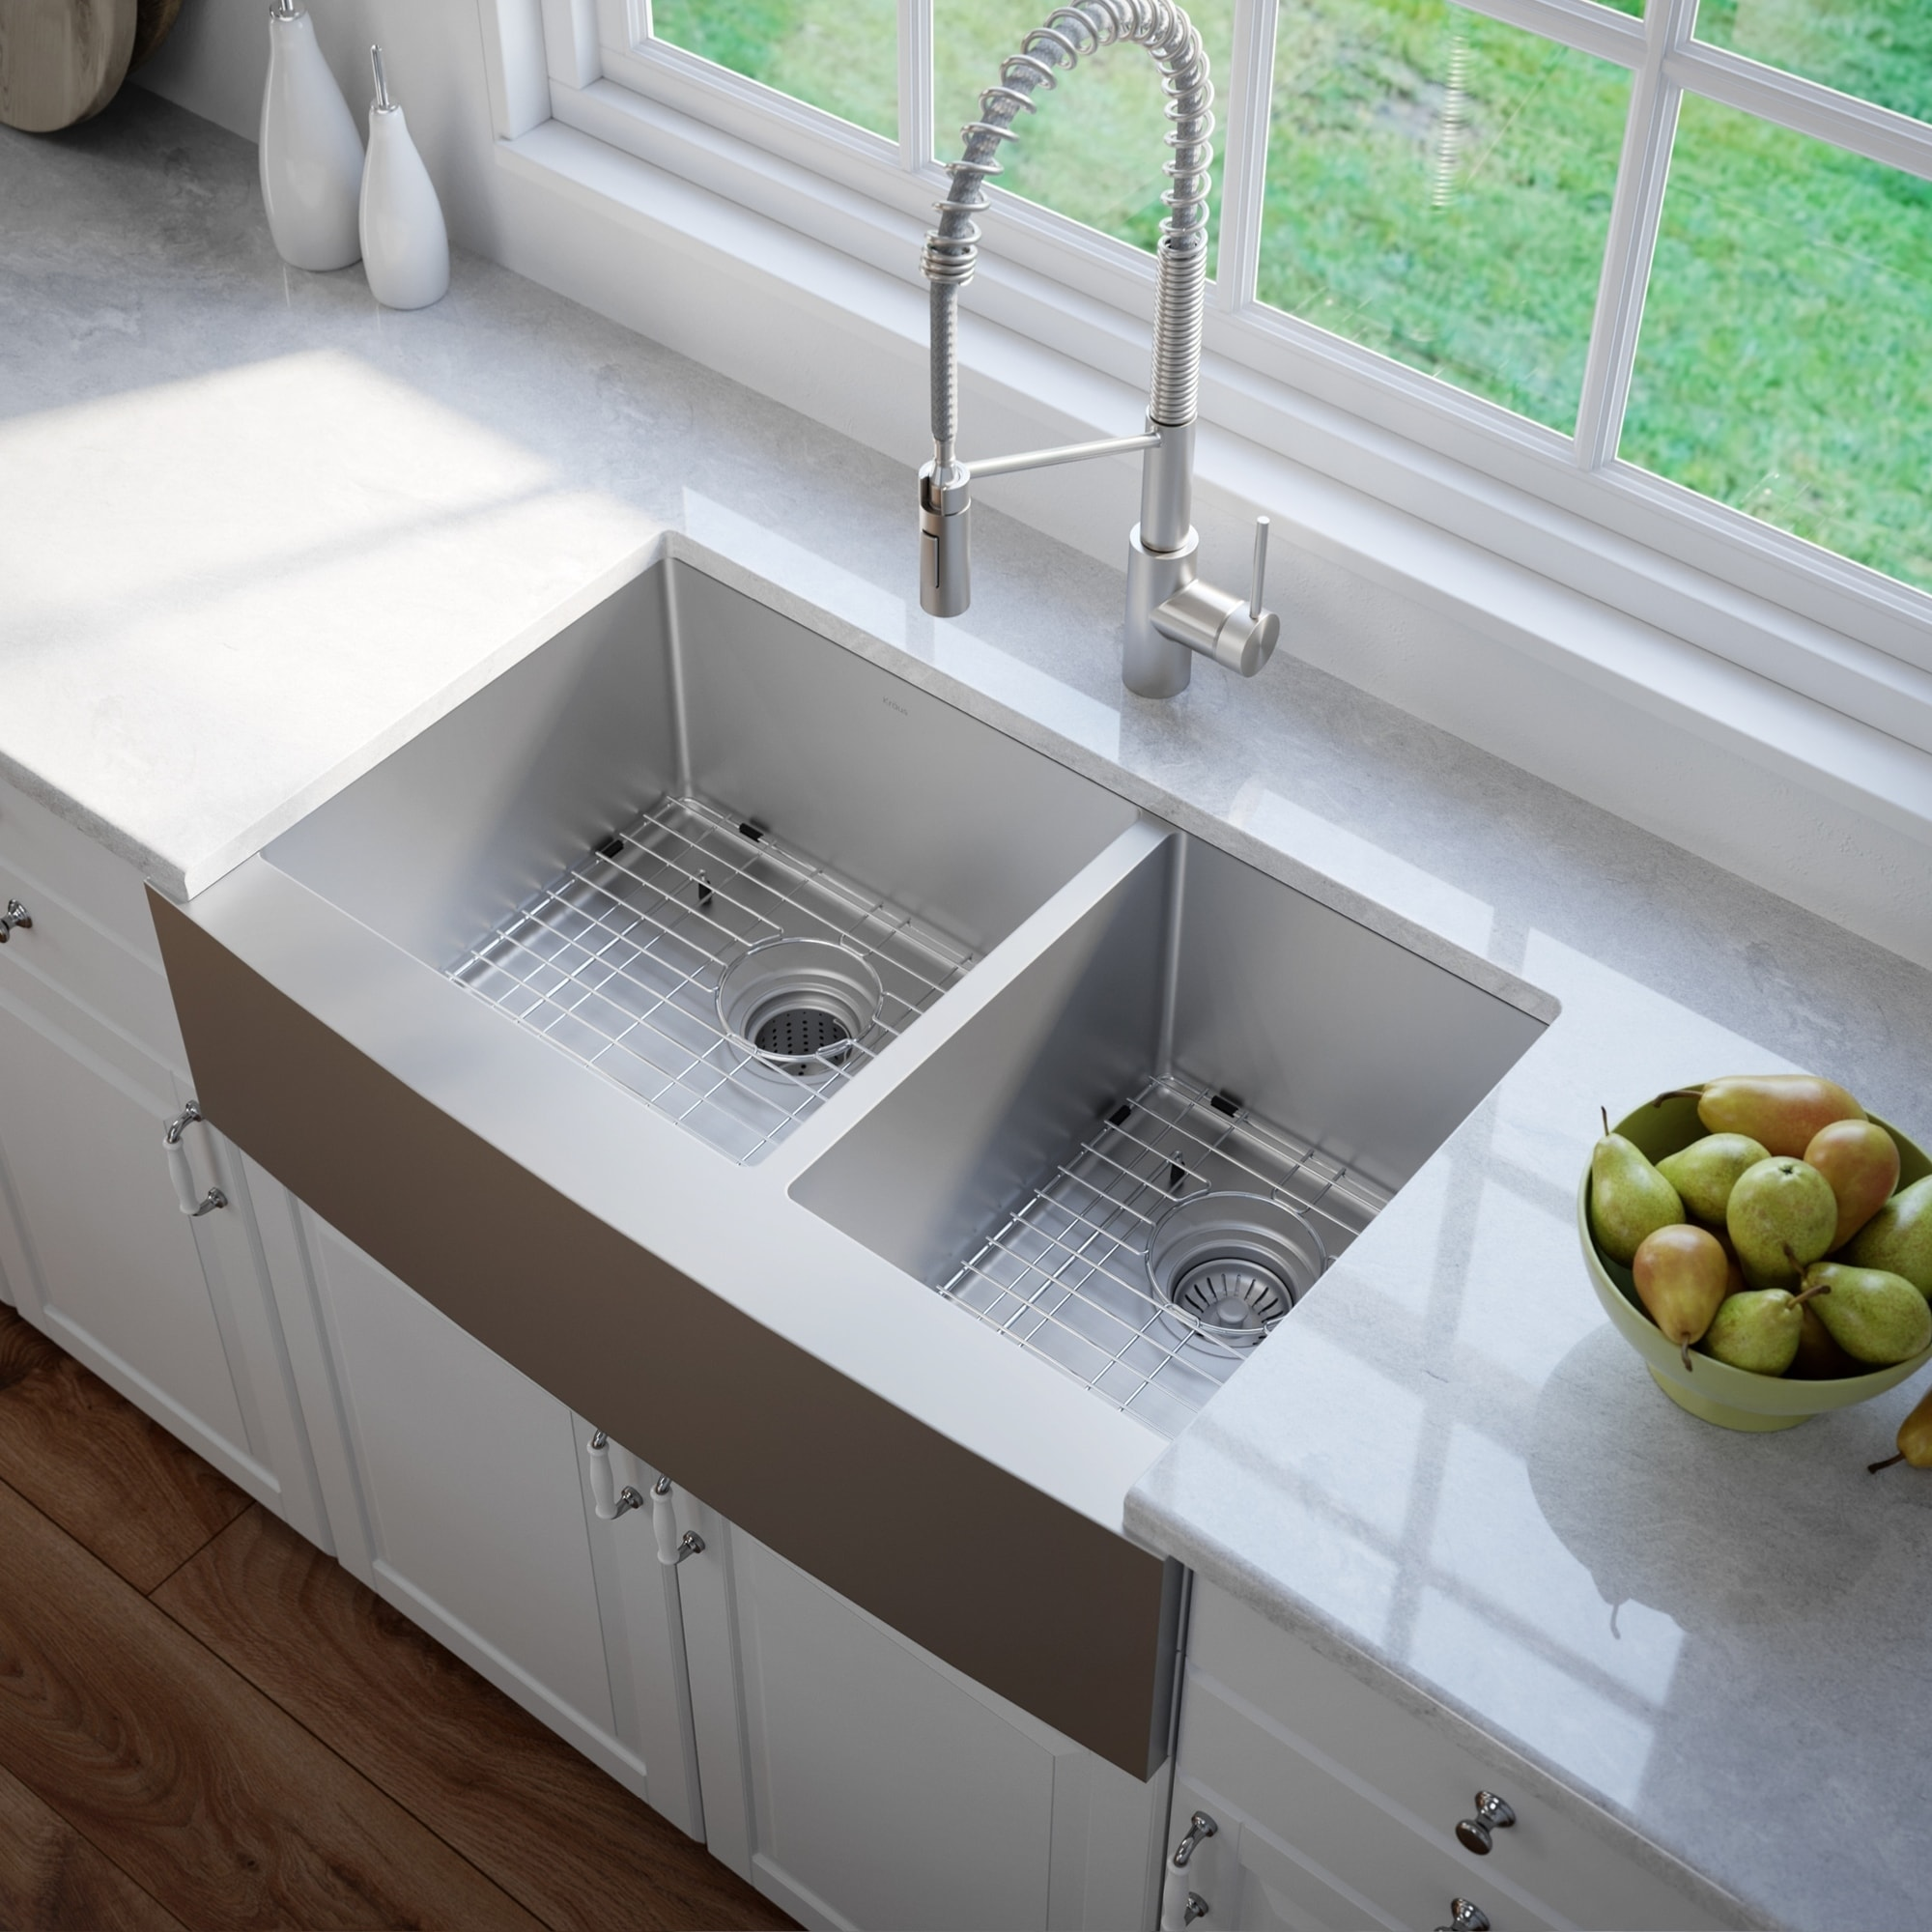 Kraus KHF200-33 Farmhouse 33 inch 1-Bowl Stainless Steel Kitchen Sink